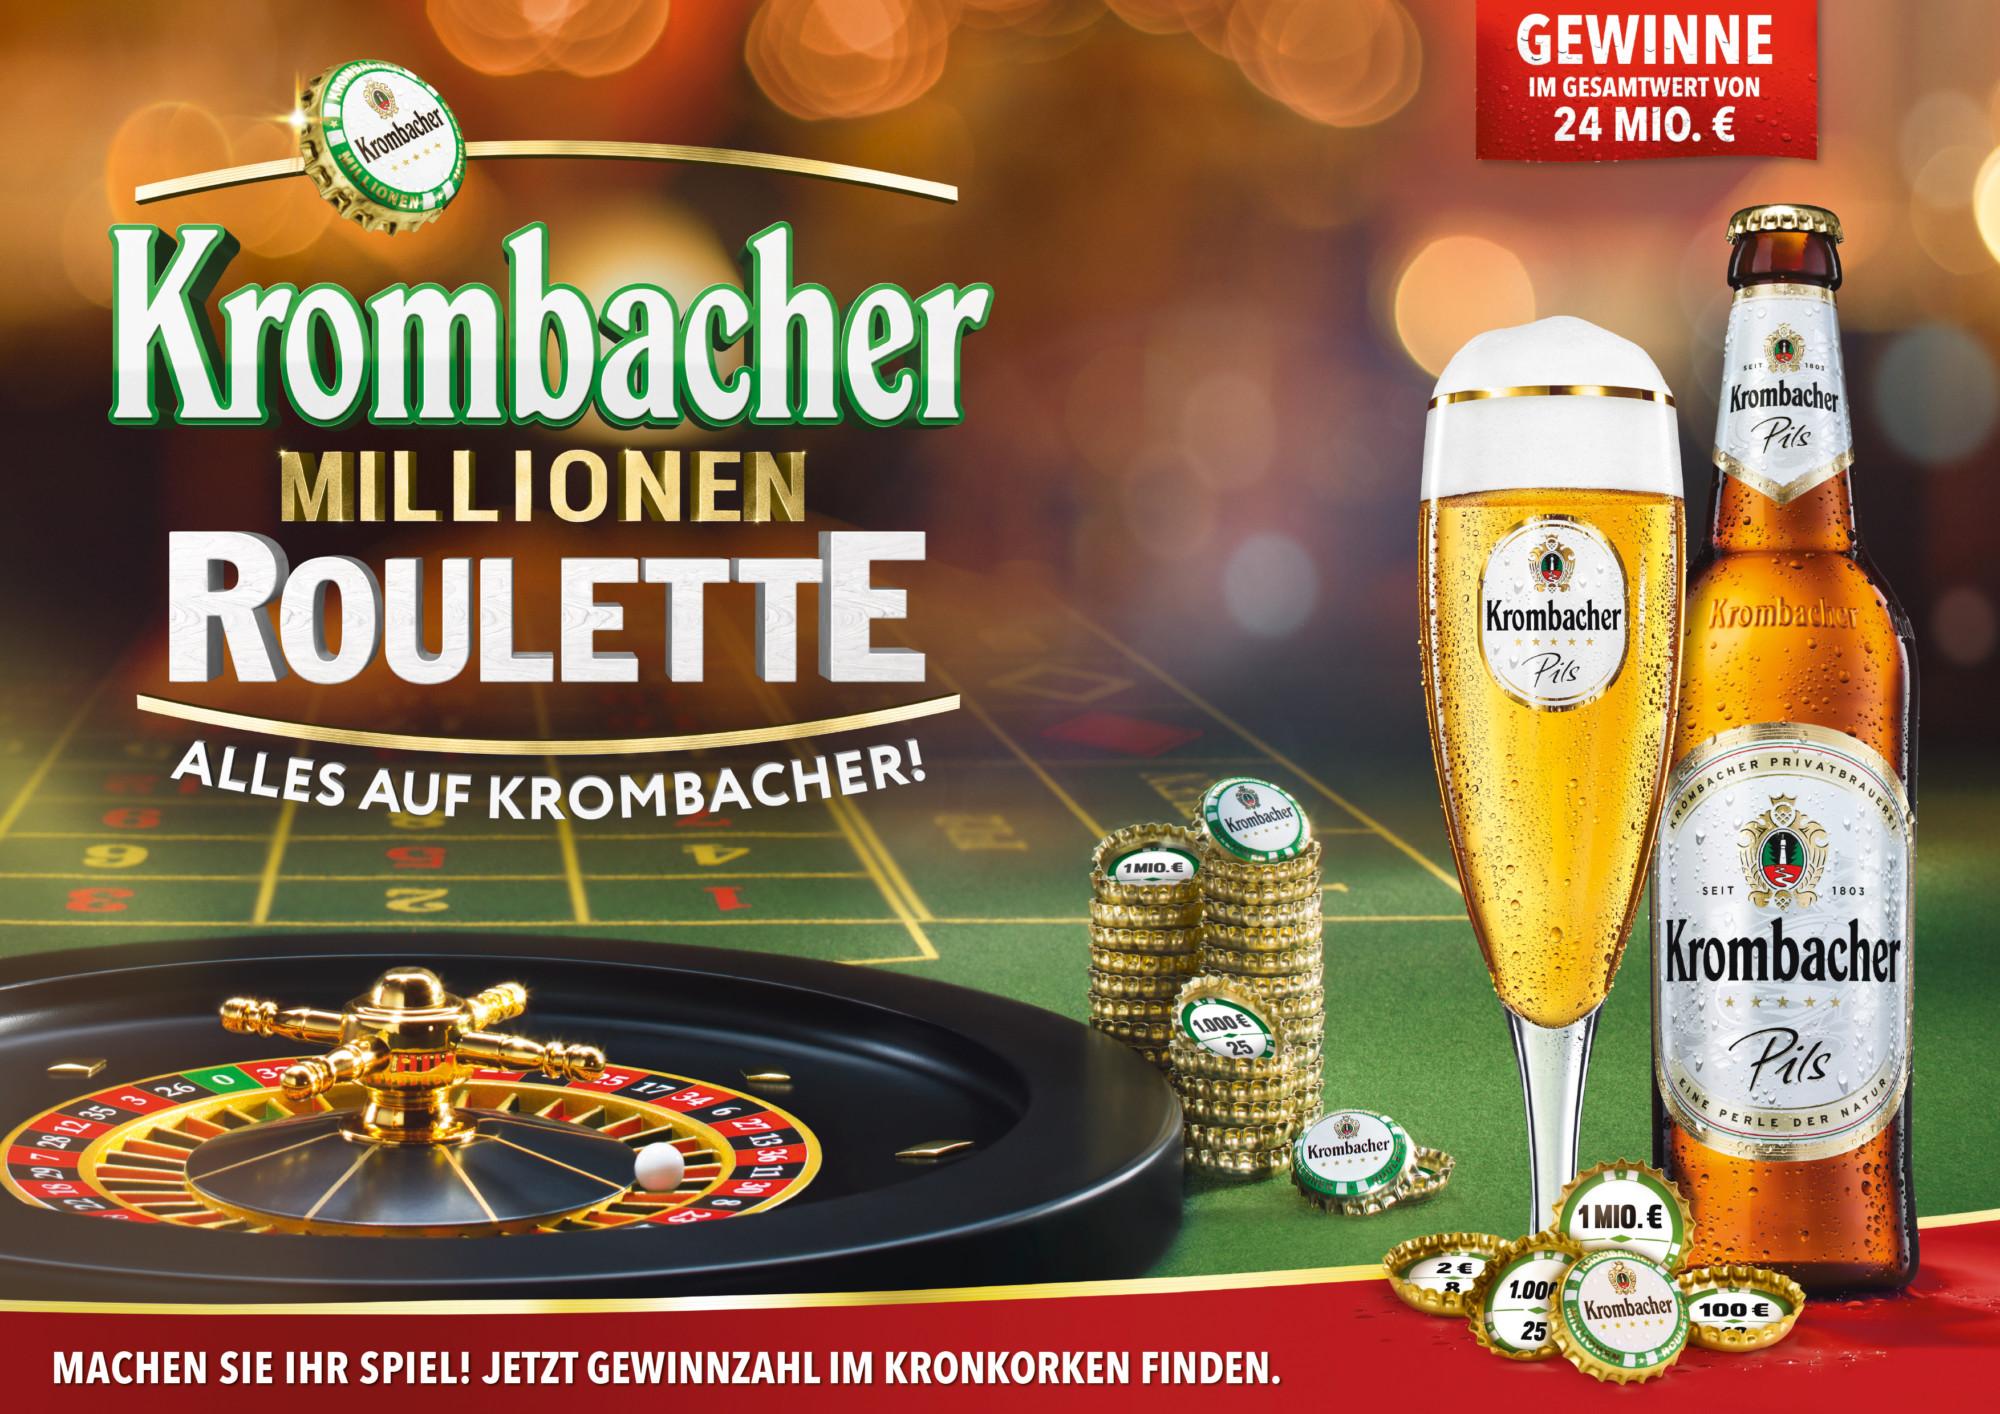 Krombacher 1 5 Millionen